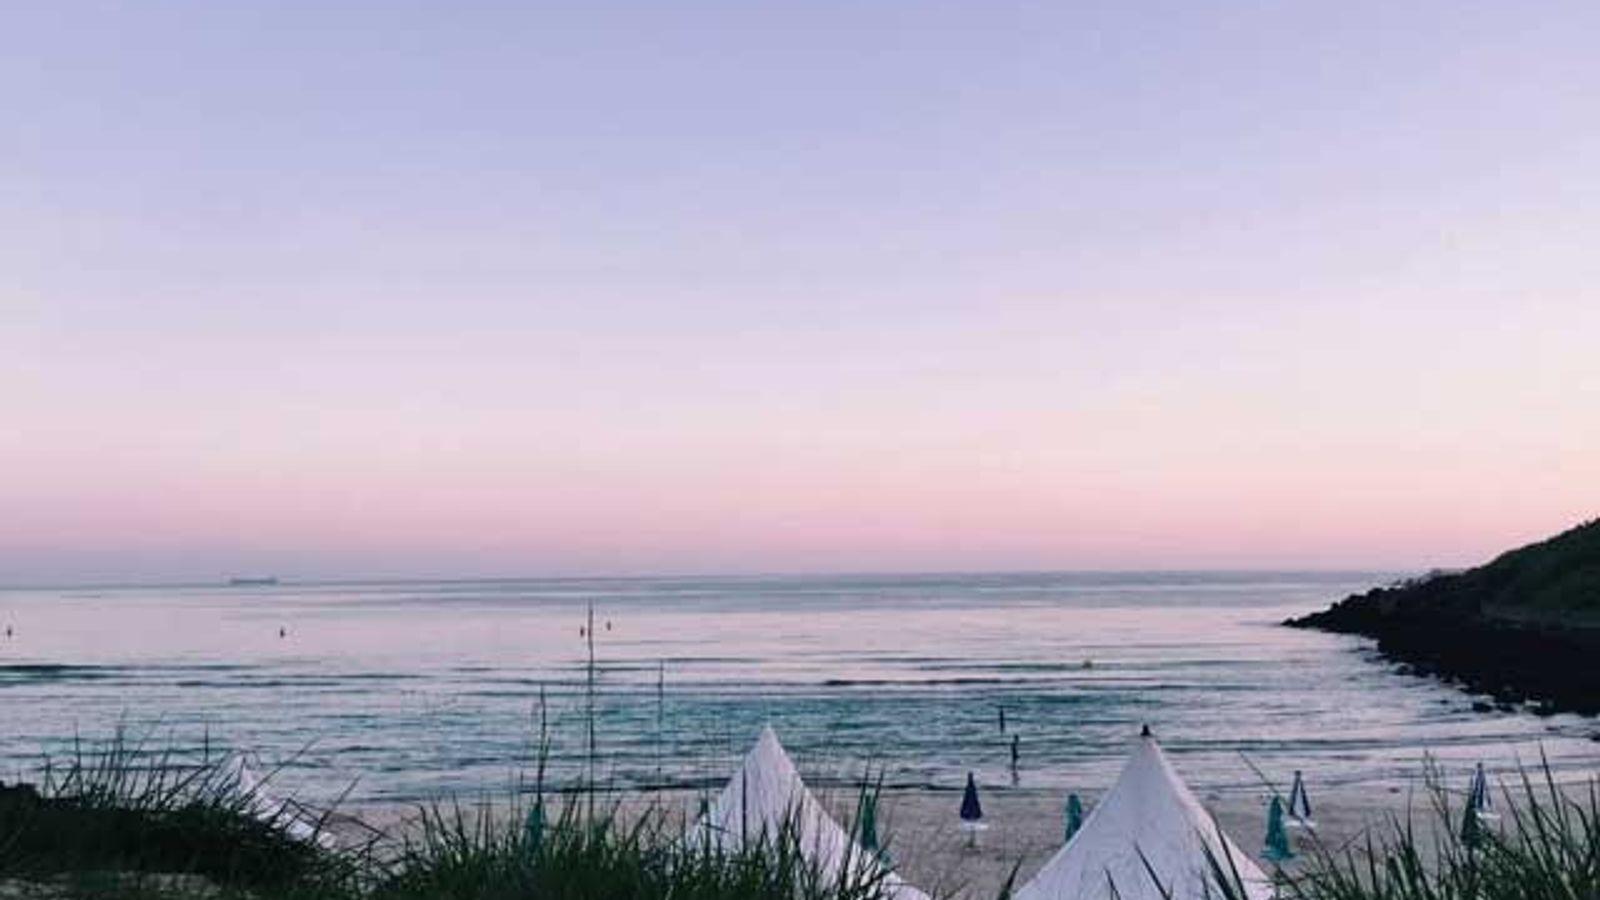 Pink skies at Hamdeok Beach.